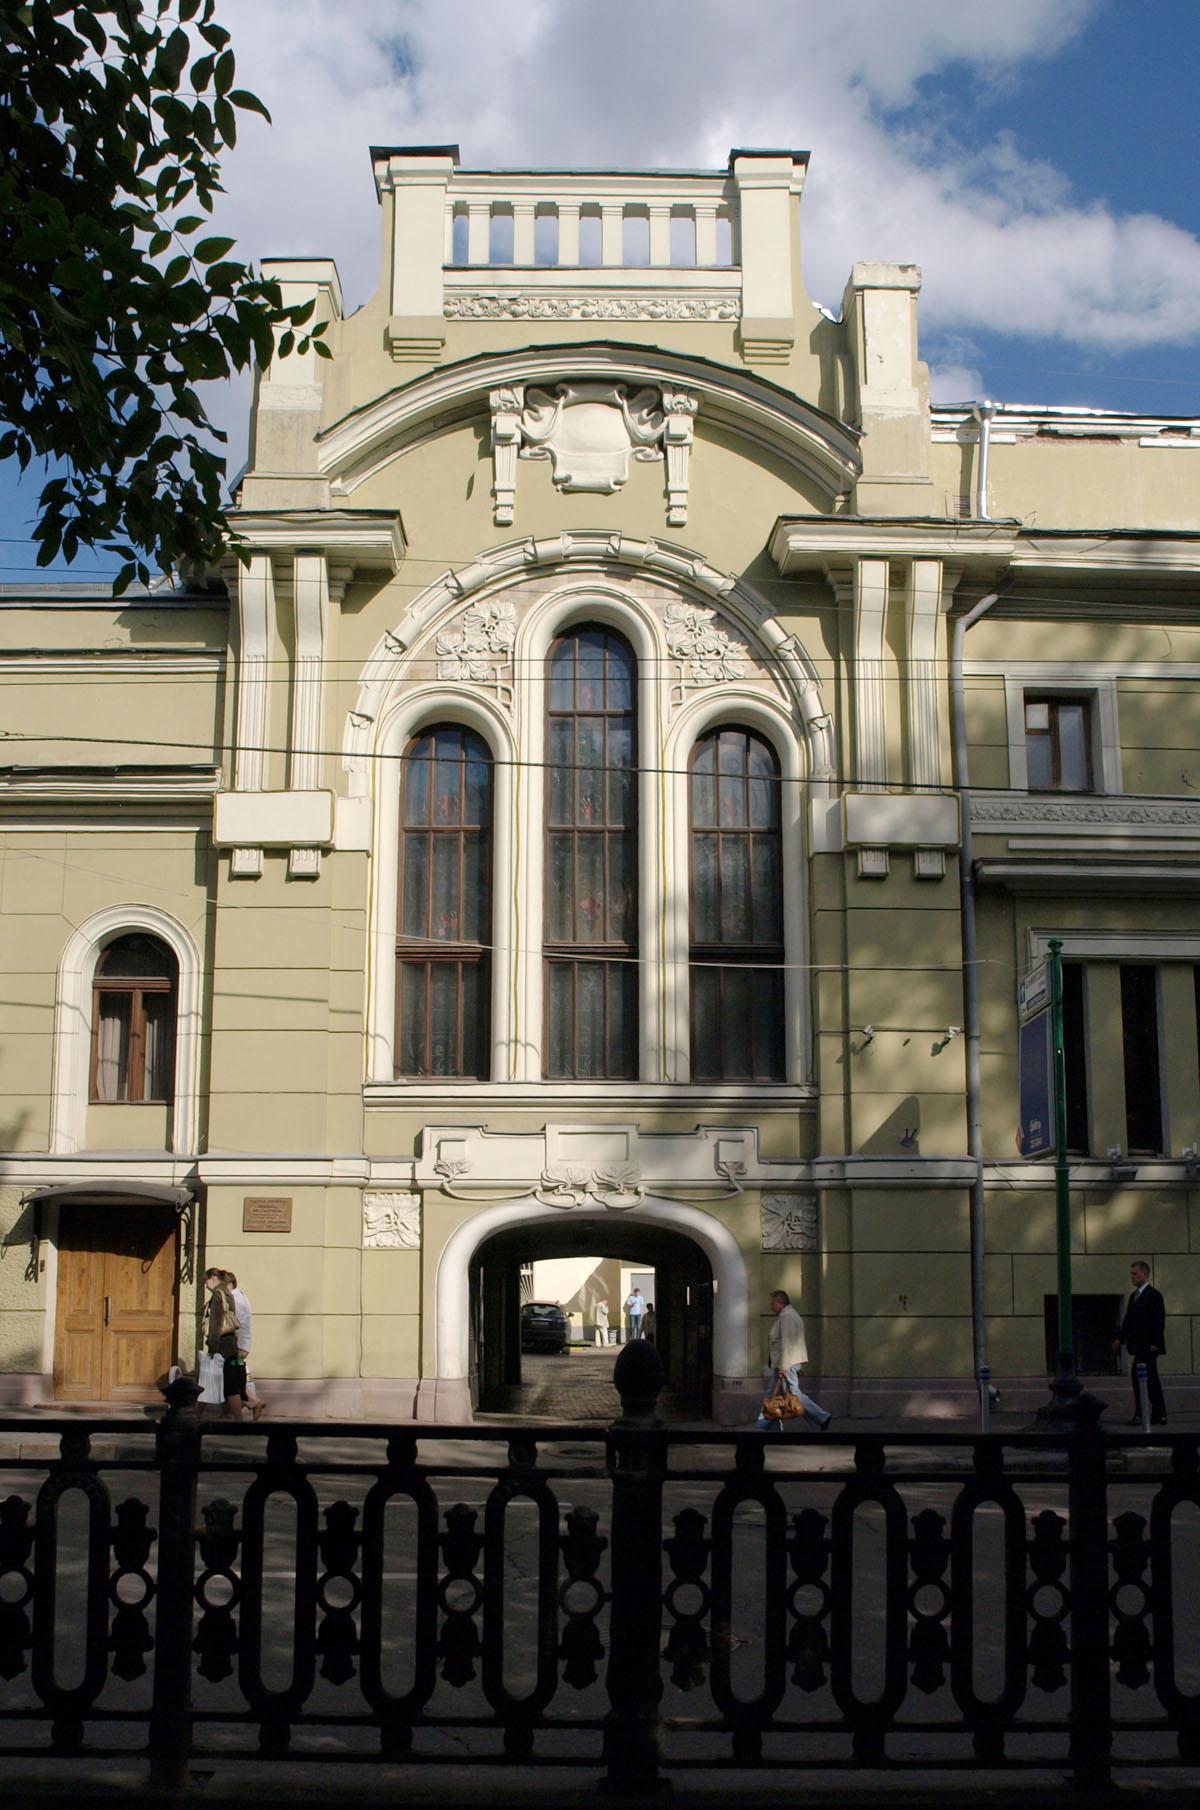 Px D D D B D Bd D B D D Ba D B D F D Bb D B D B D Ba D B likewise  besides Wiki Tverskoy Boulevard also Char Okul moreover Px Boris And Gleb Church In Velikiy Novgorod. on f d ba b bd